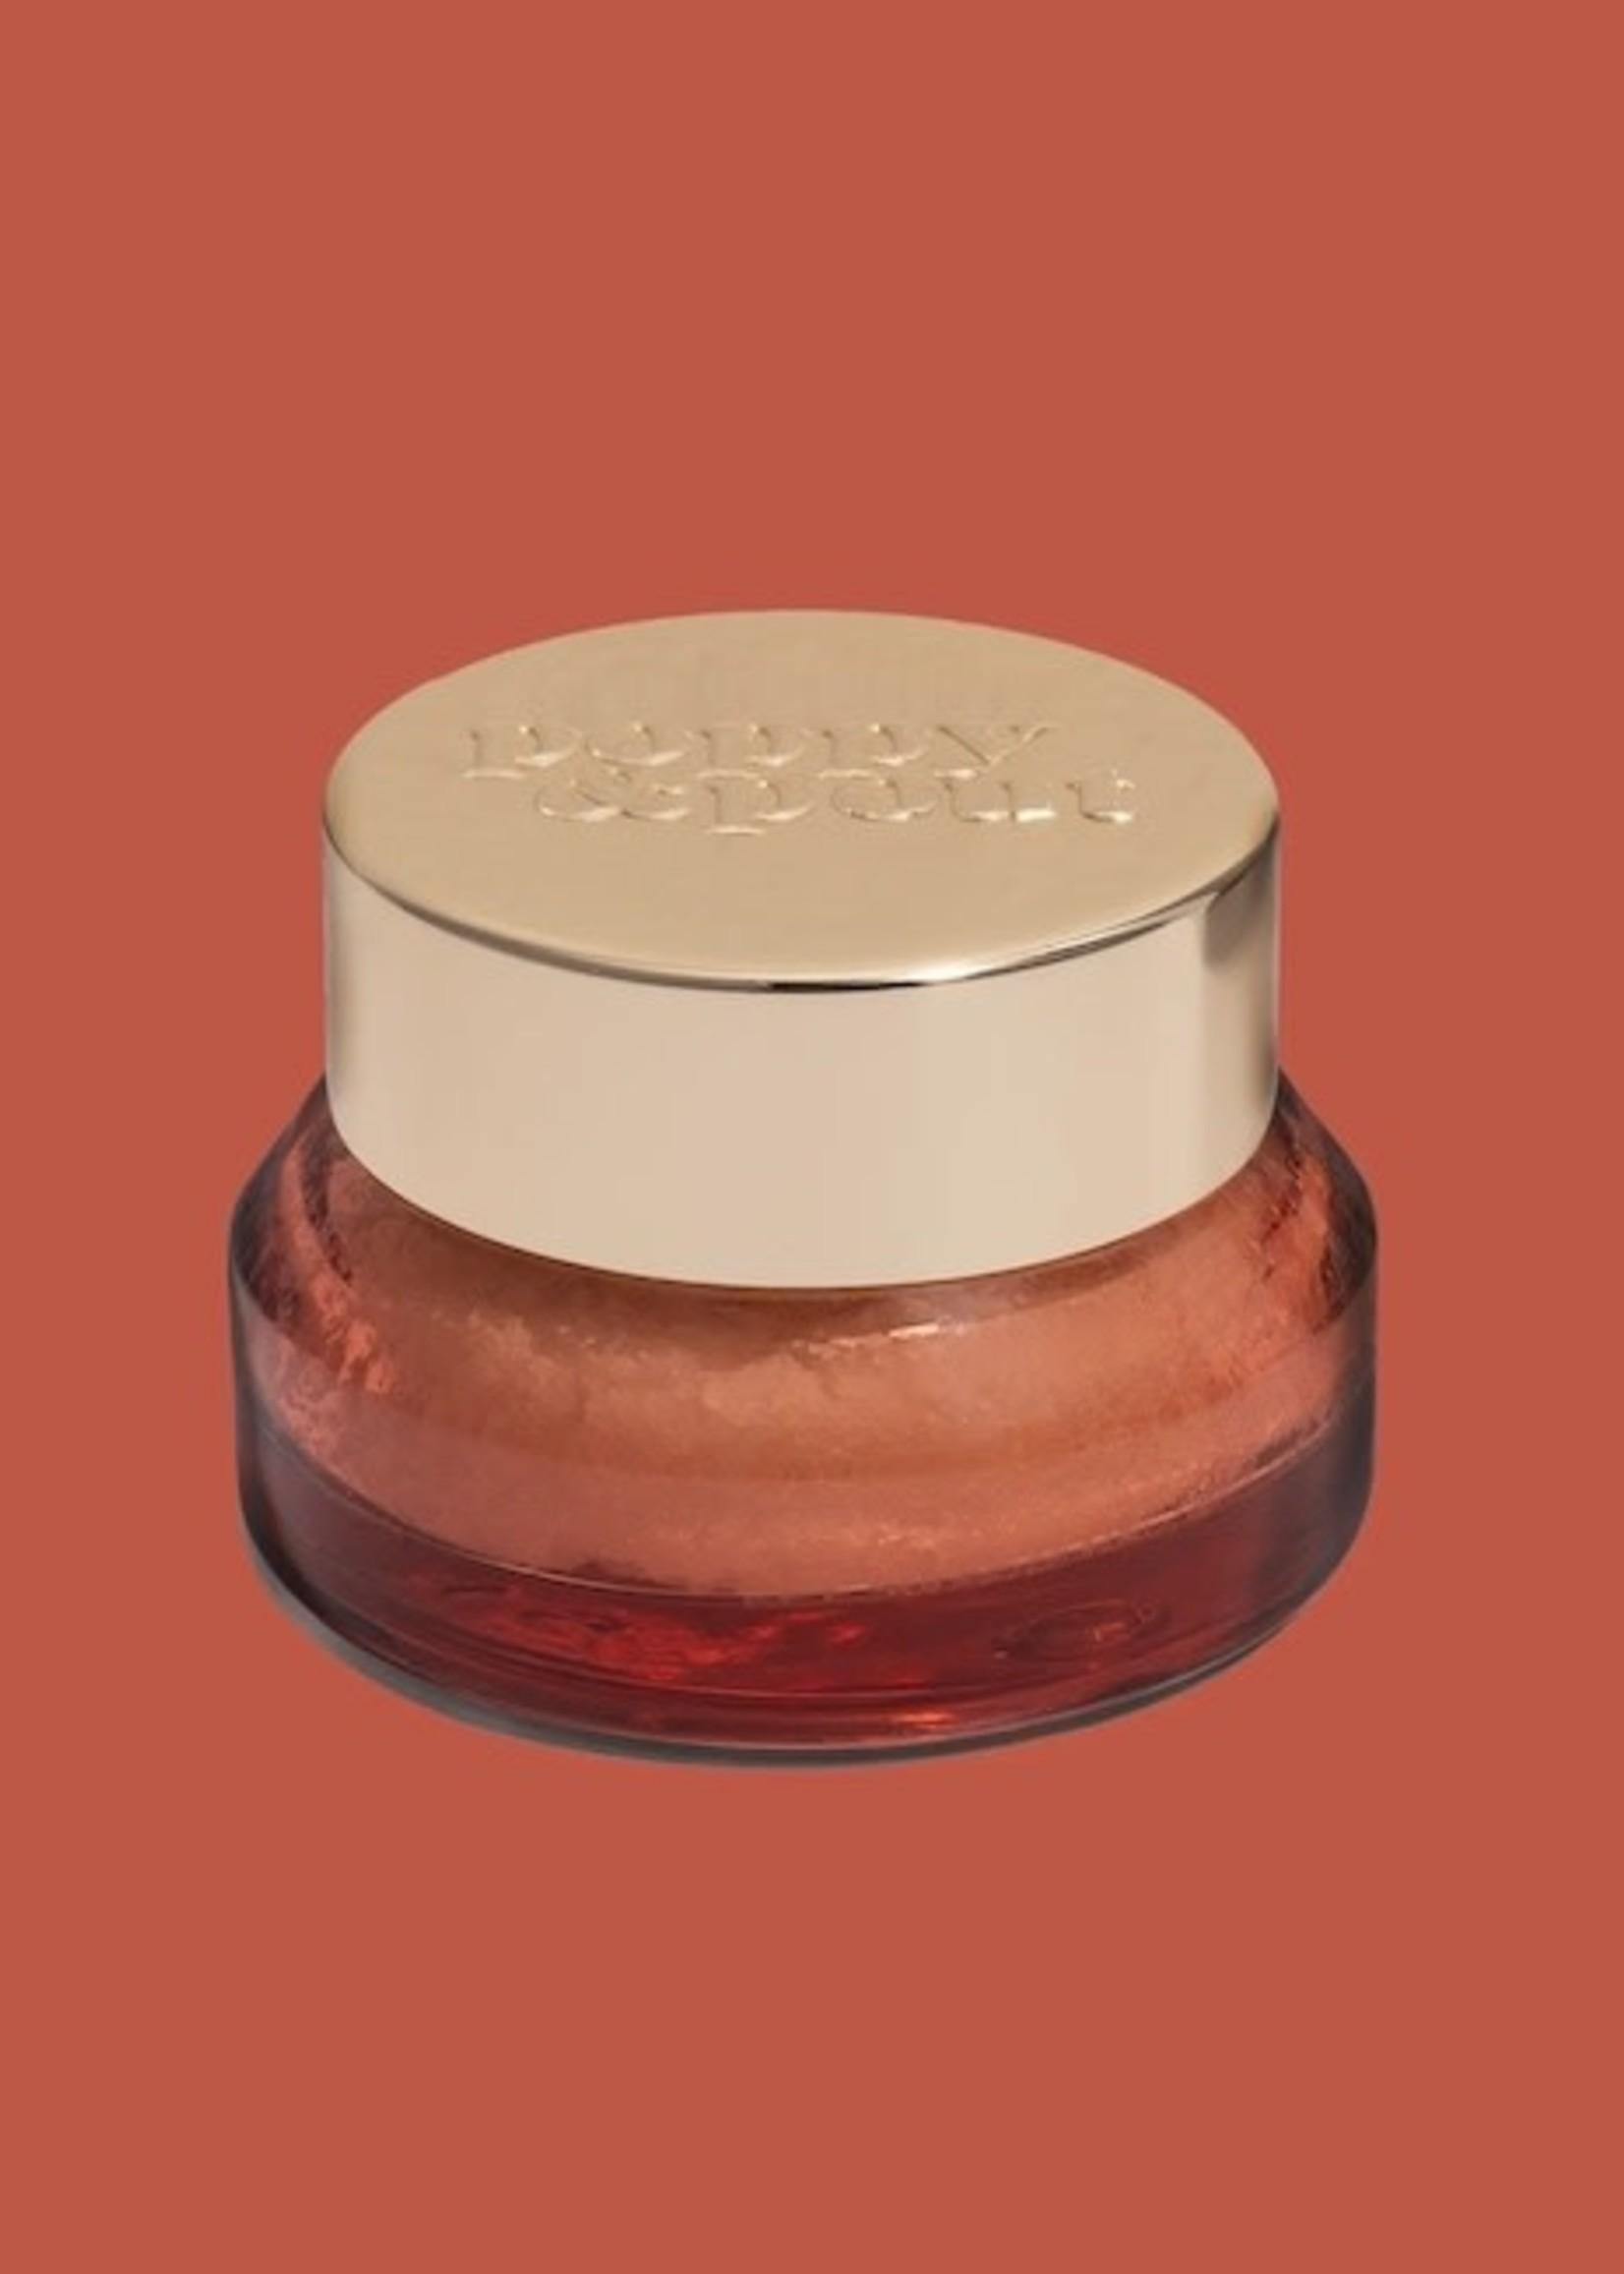 Poppy & Pout Pomegranate Lip Scrub